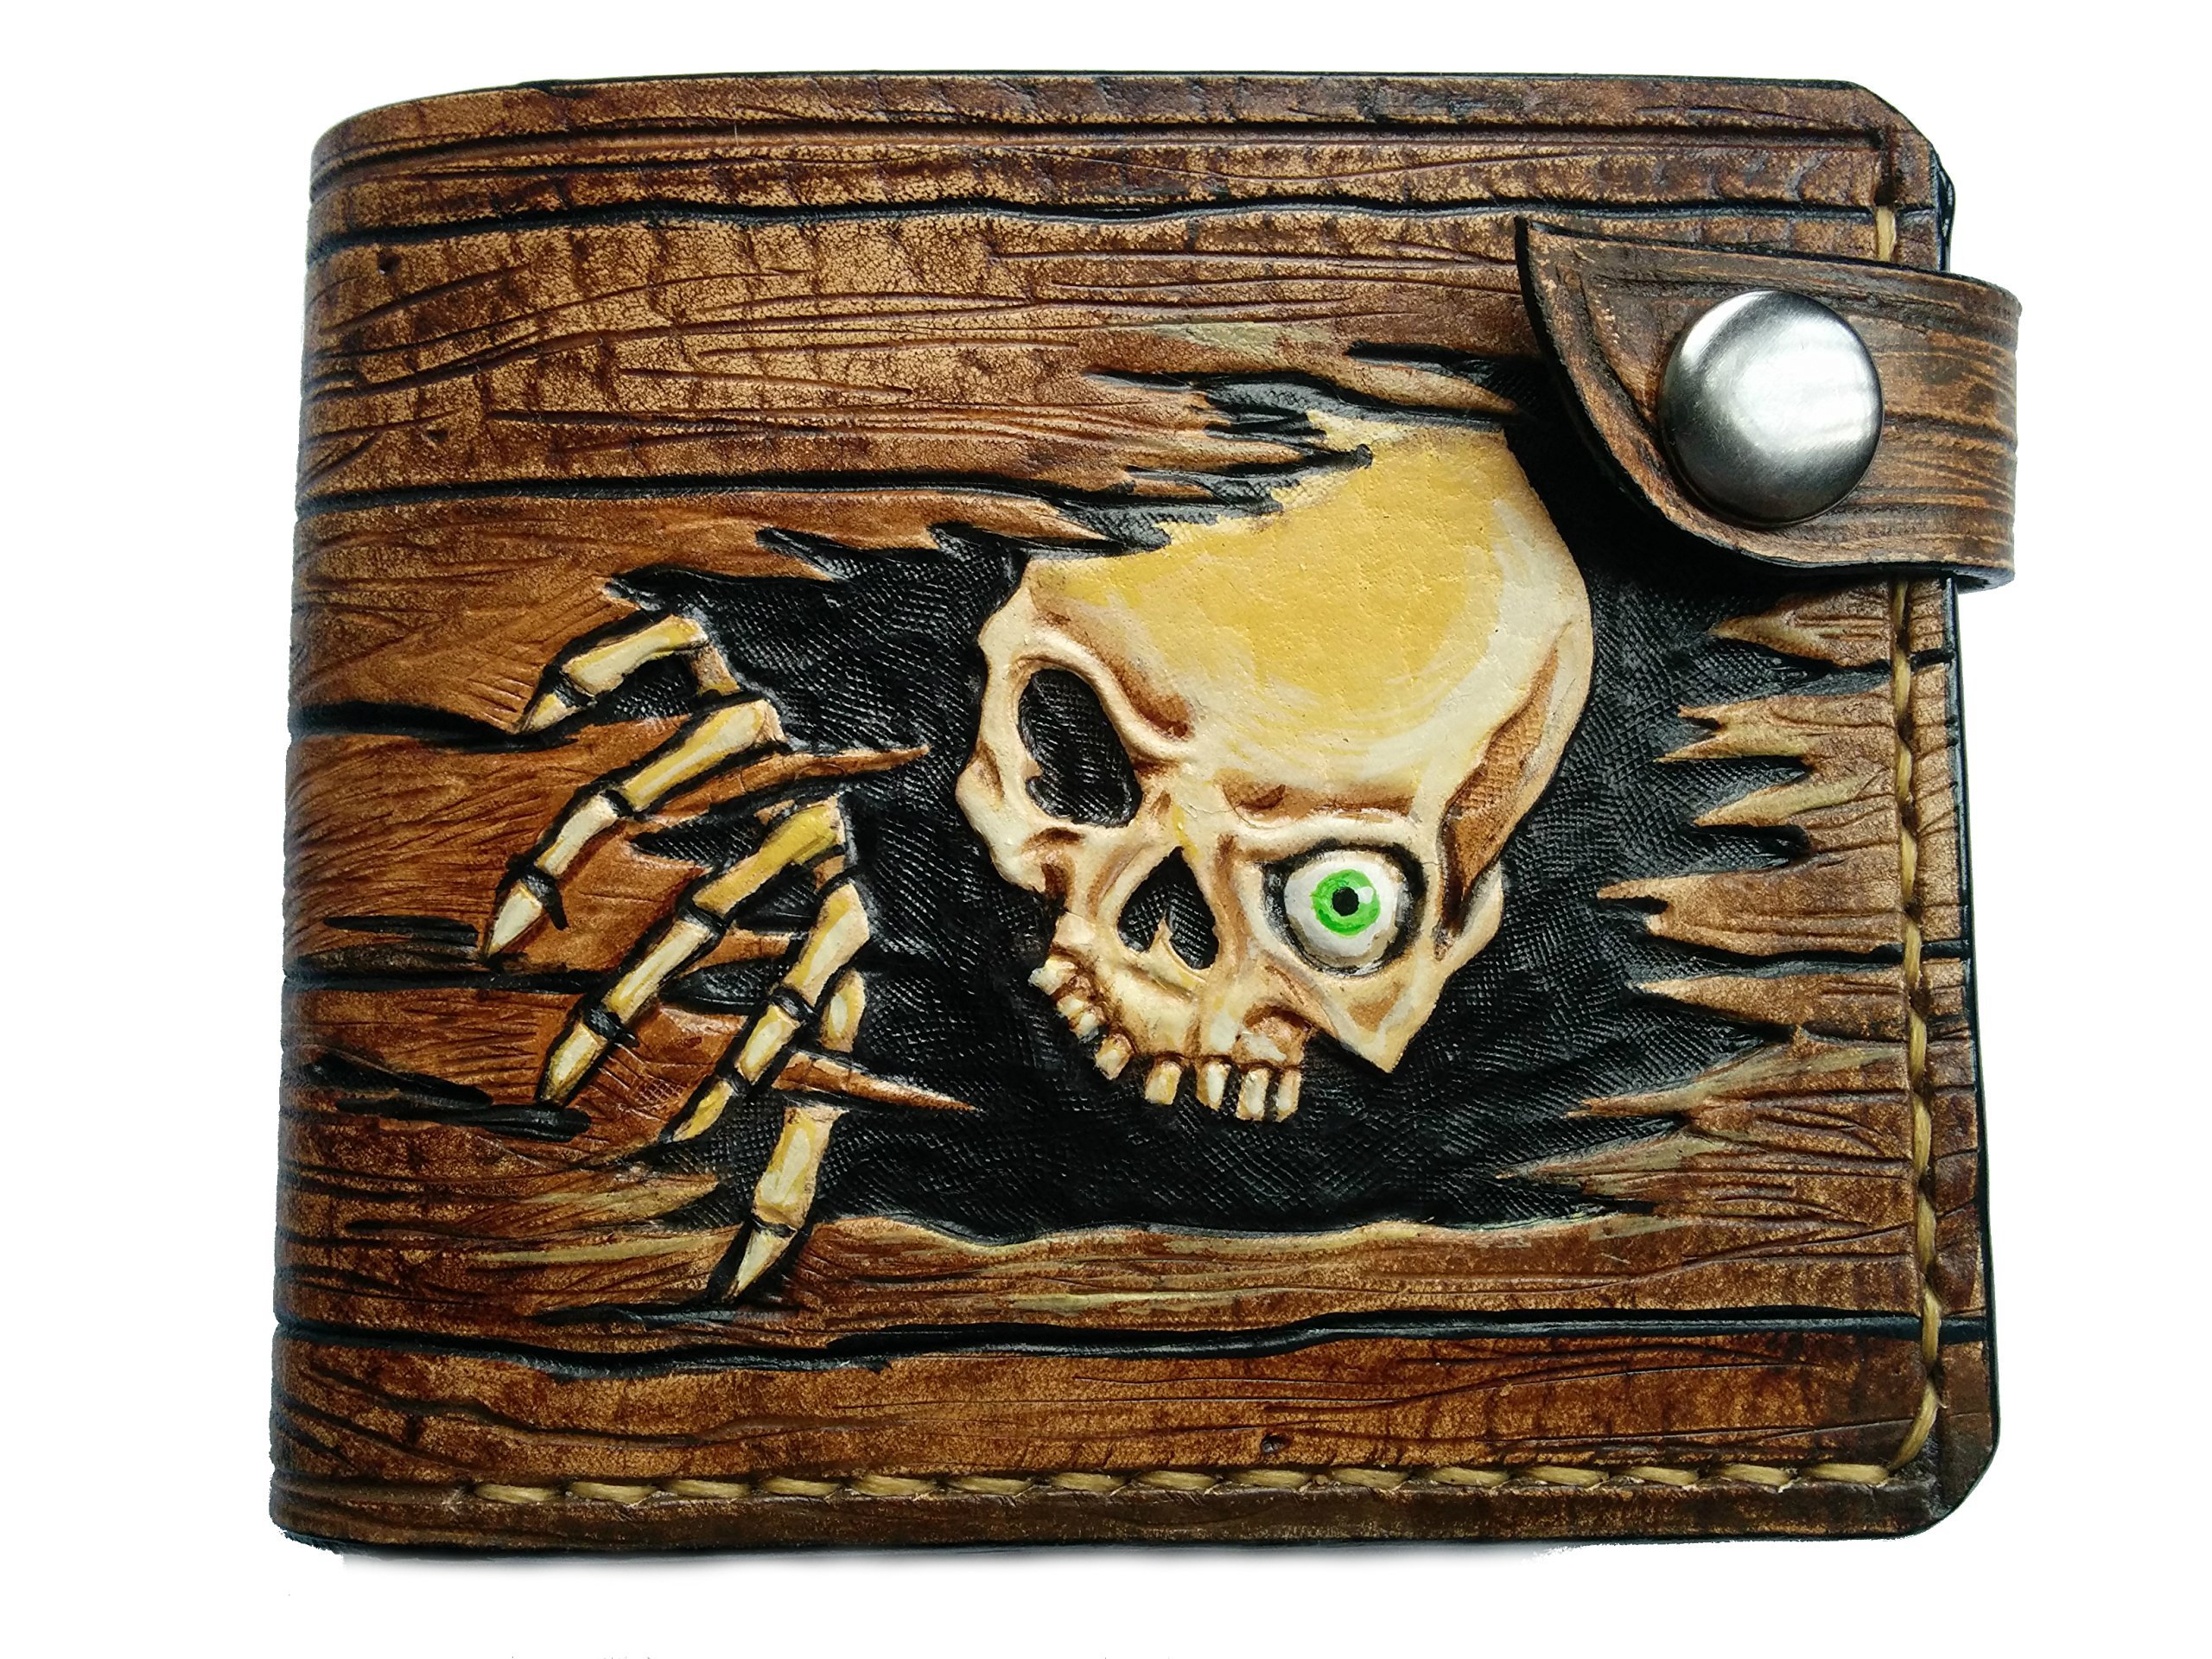 Men's 3D Genuine Leather Wallet, Hand-Carved, Hand-Painted, Leather Carving, Custom wallet, Personalized wallet, Skull wallet, Skeleton wallet